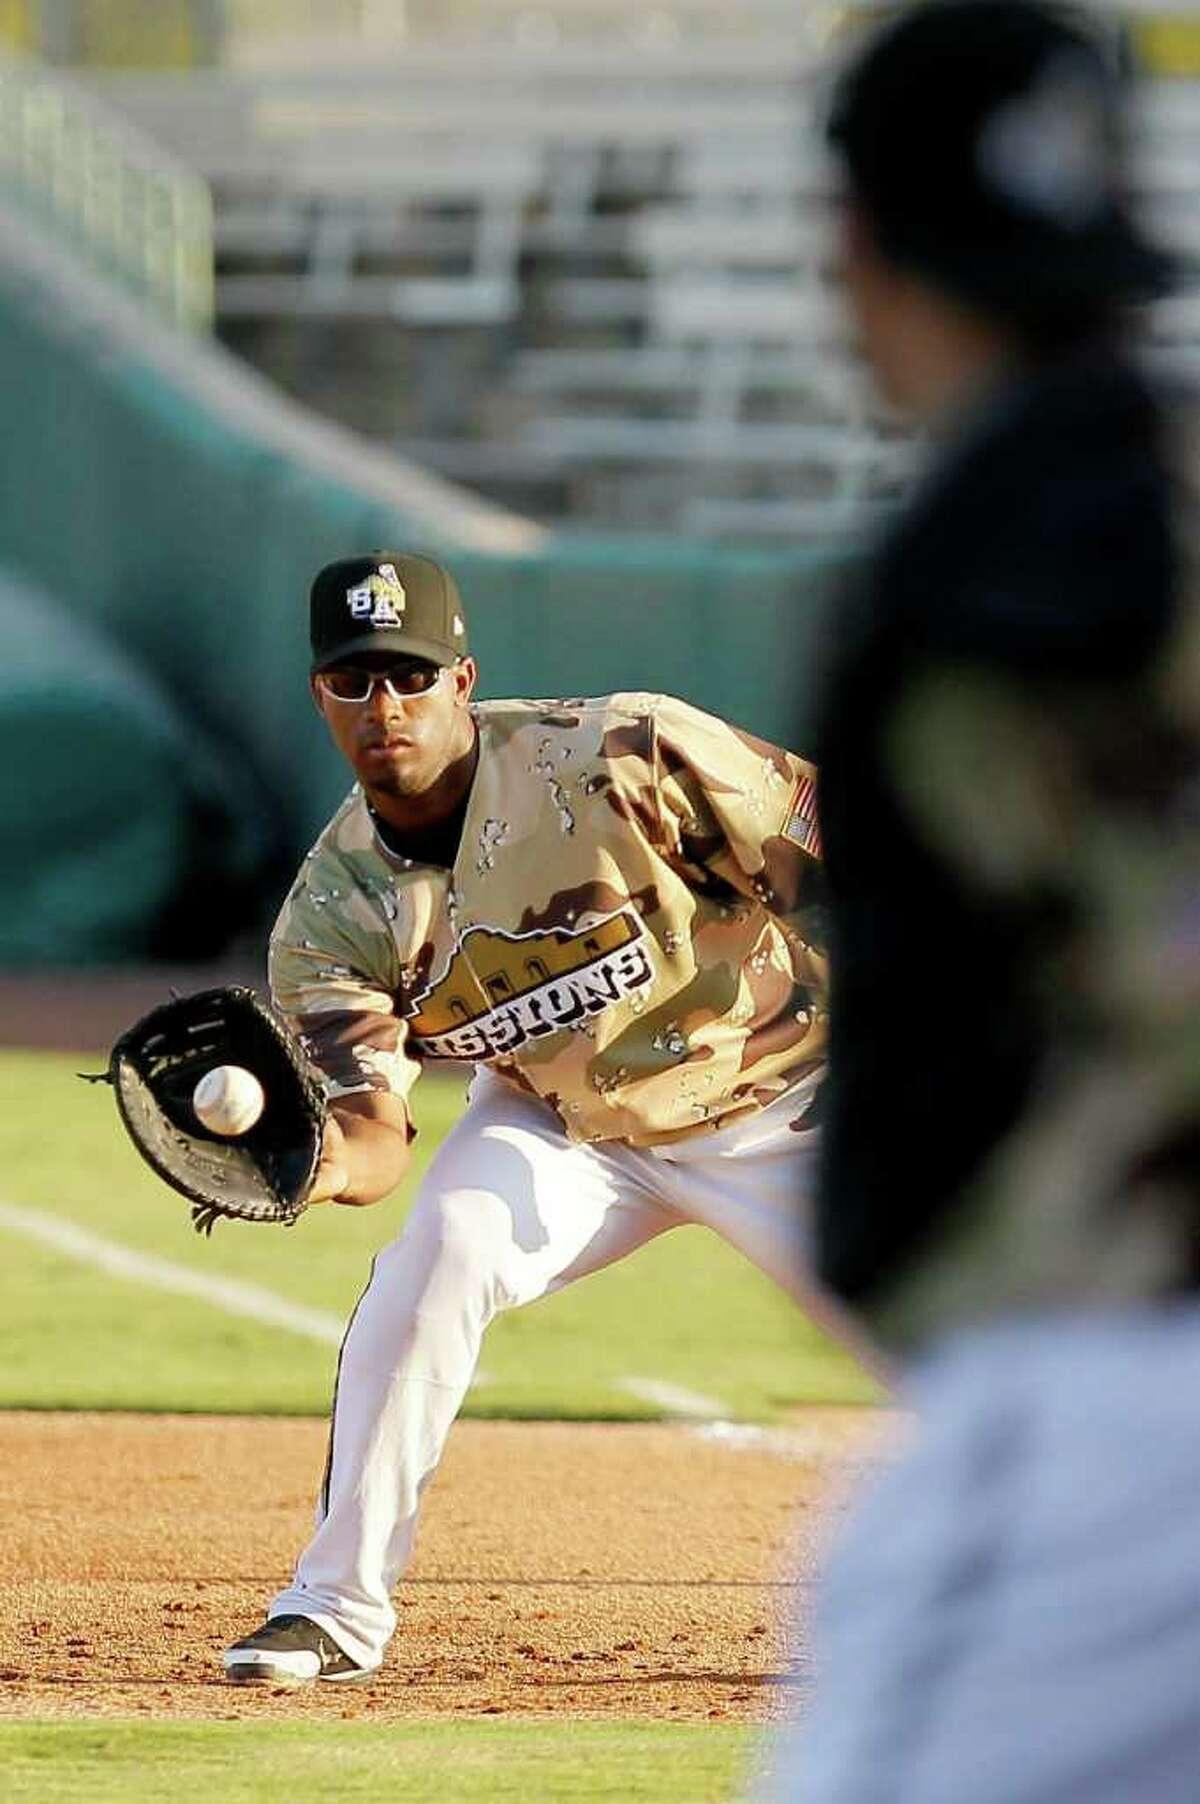 San Antonio Missions first baseman Carlos Sosa catches the ball during a Texas League baseball game against the Arkansas Travelers, Sunday, Aug. 21, 2011, in San Antonio.